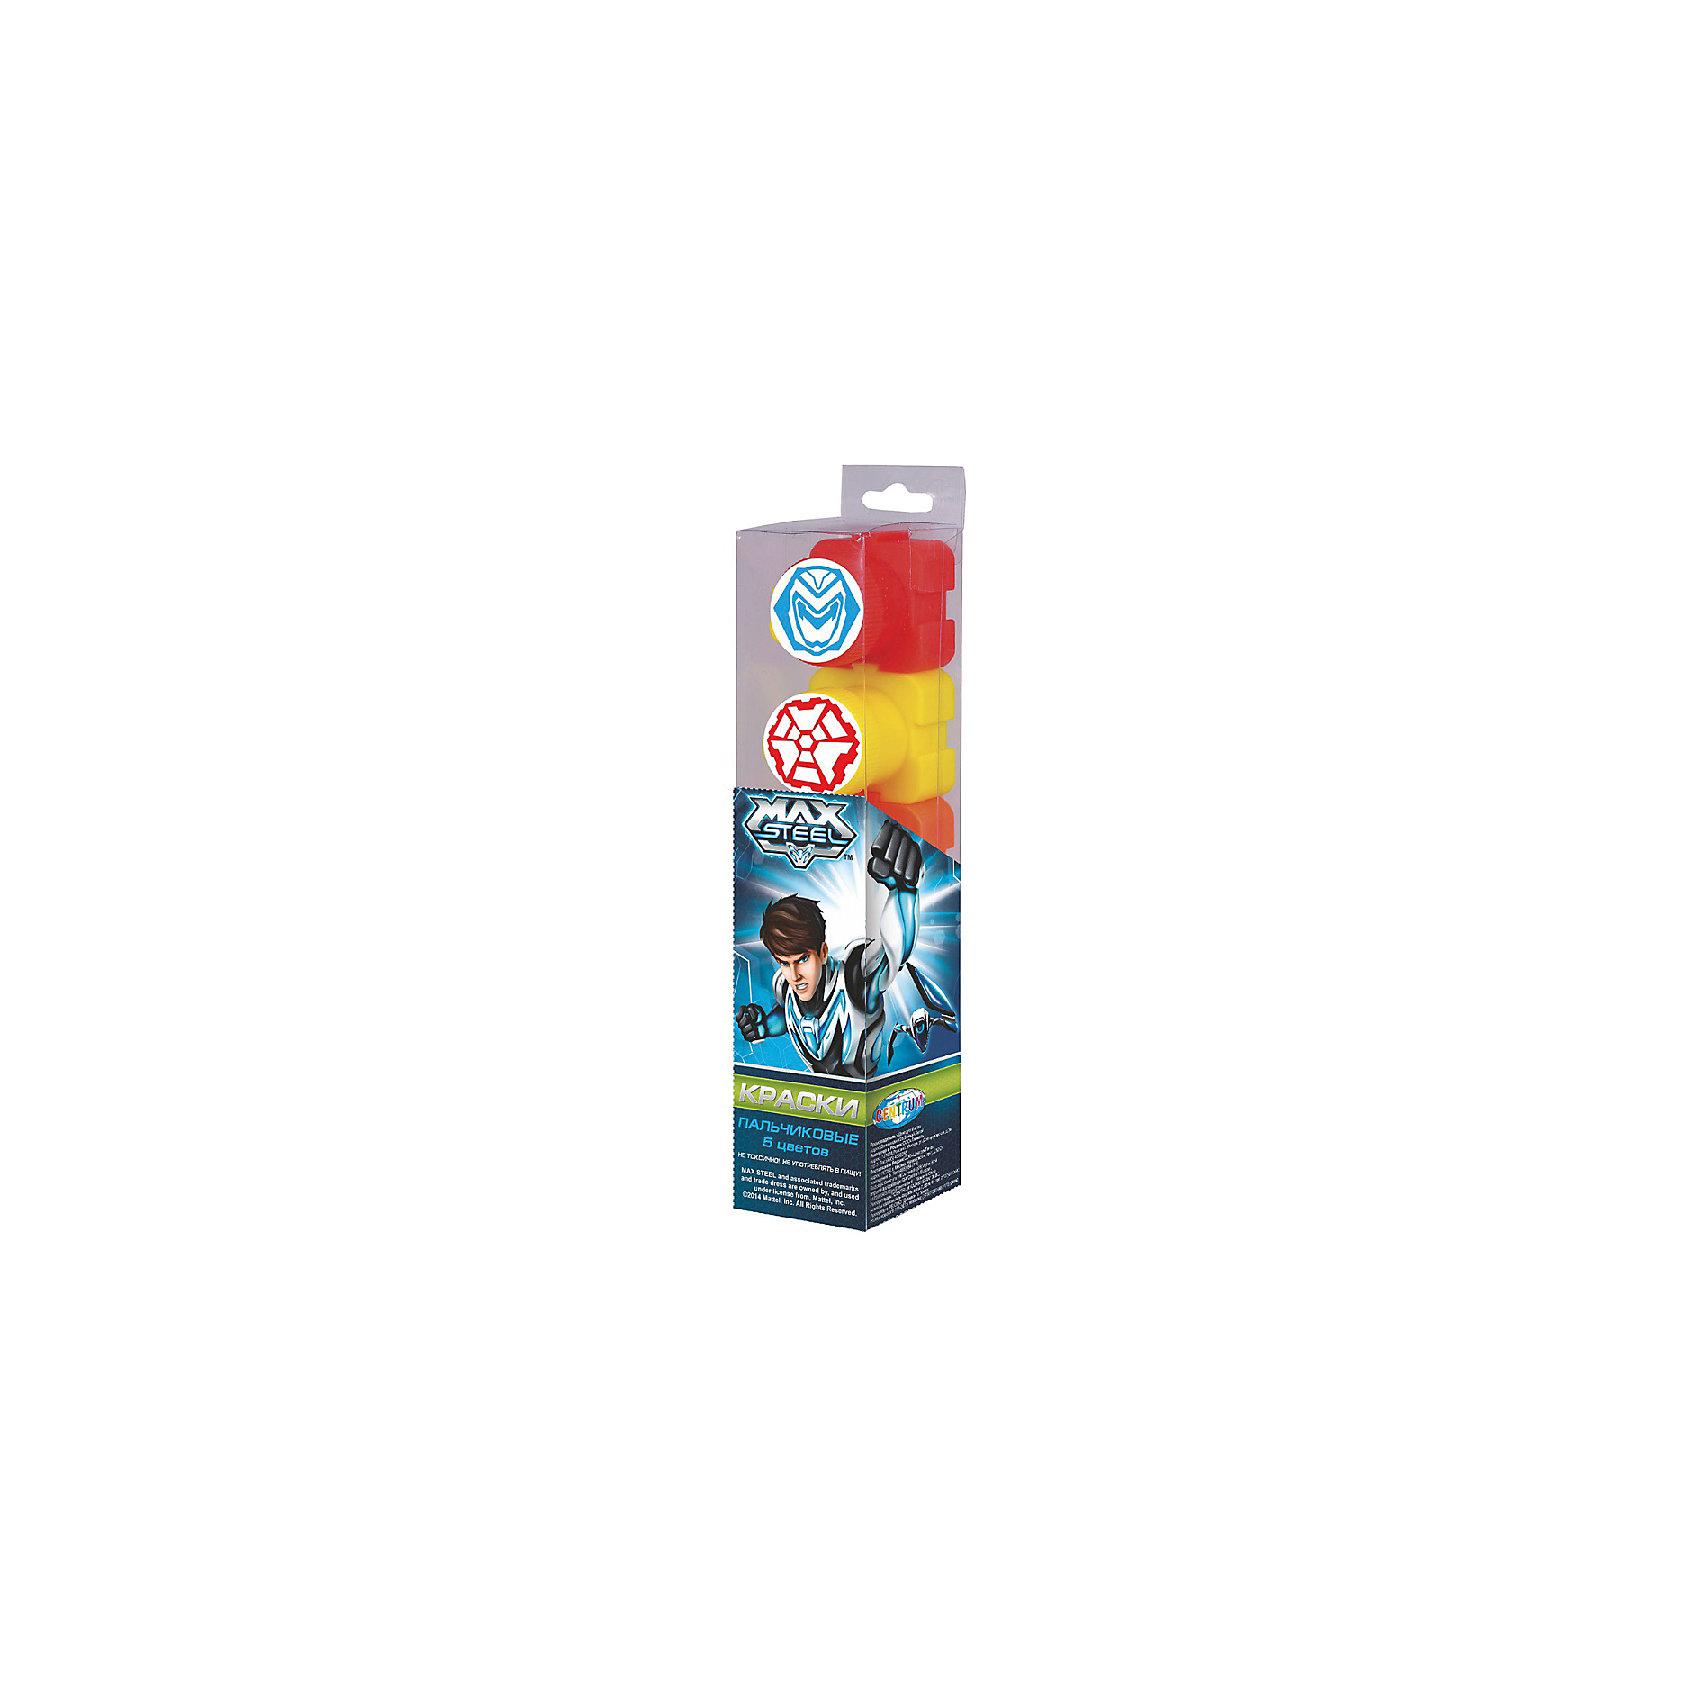 CENTRUM Пальчиковые краски со штампами (5 цветов х 20мл), Max Steel краски спейс краски пальчиковые 6 цветов сенсорные